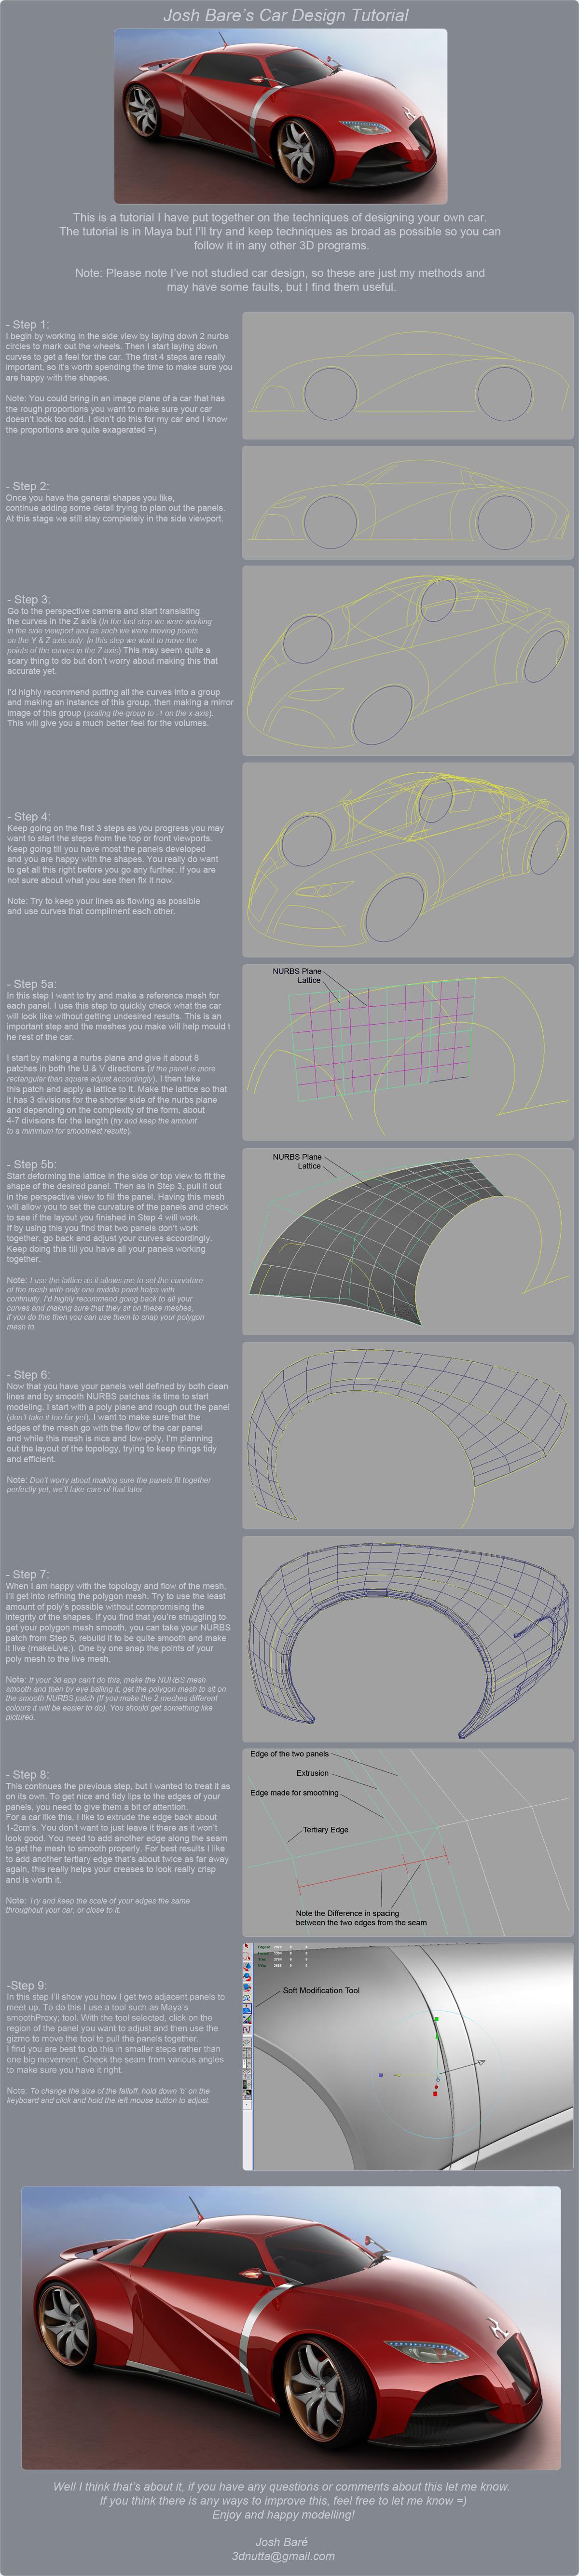 3DnuTTa's Car Design Tutorial